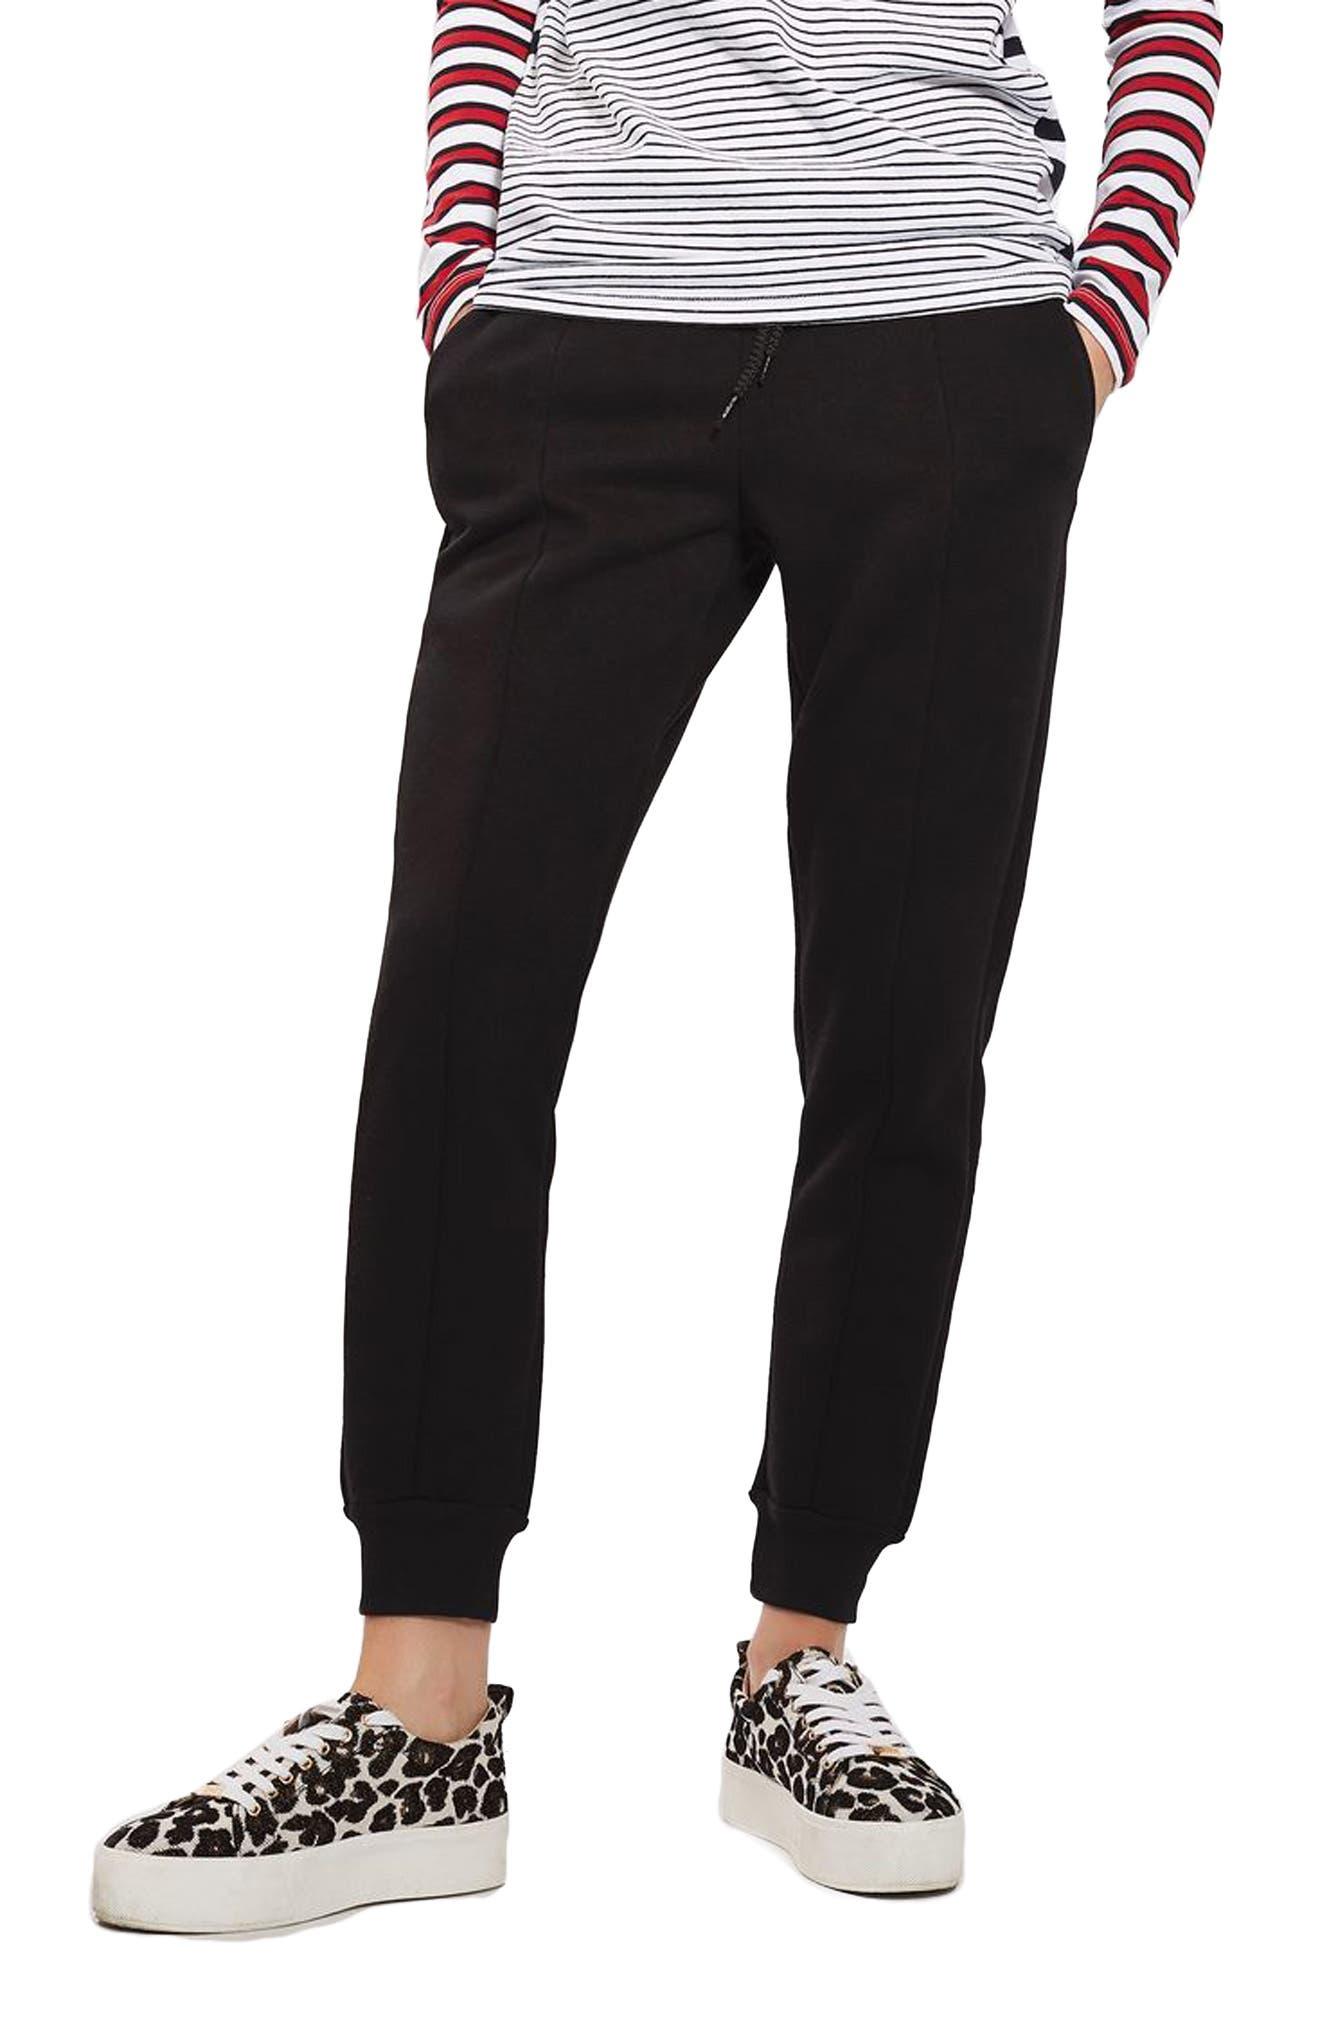 Clean Seam Jogger Pants,                             Main thumbnail 1, color,                             Black